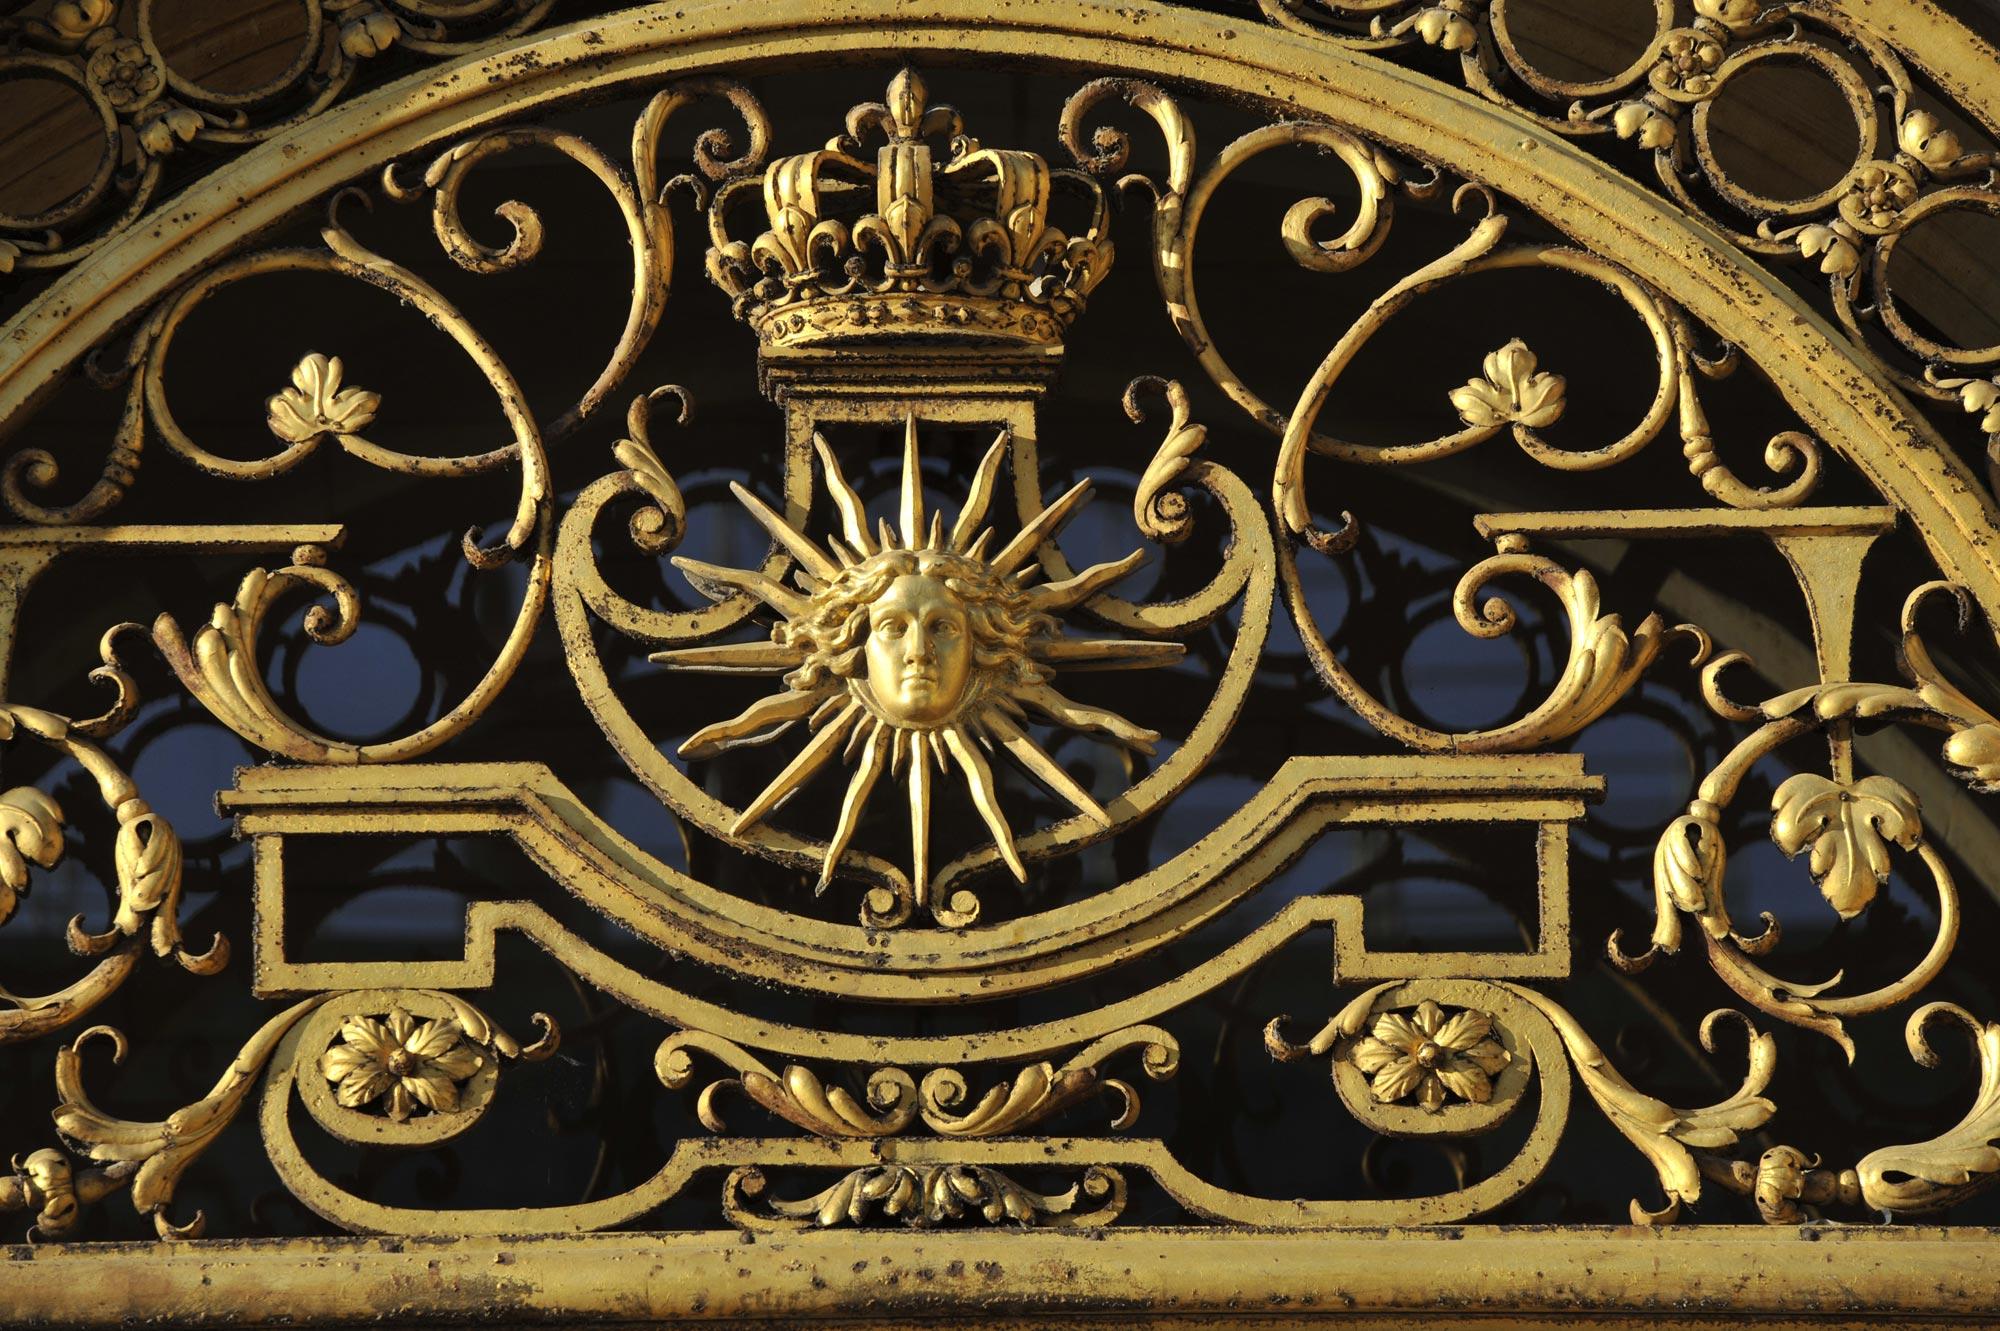 1670 discover the 3d scale models versailles 3d. Black Bedroom Furniture Sets. Home Design Ideas